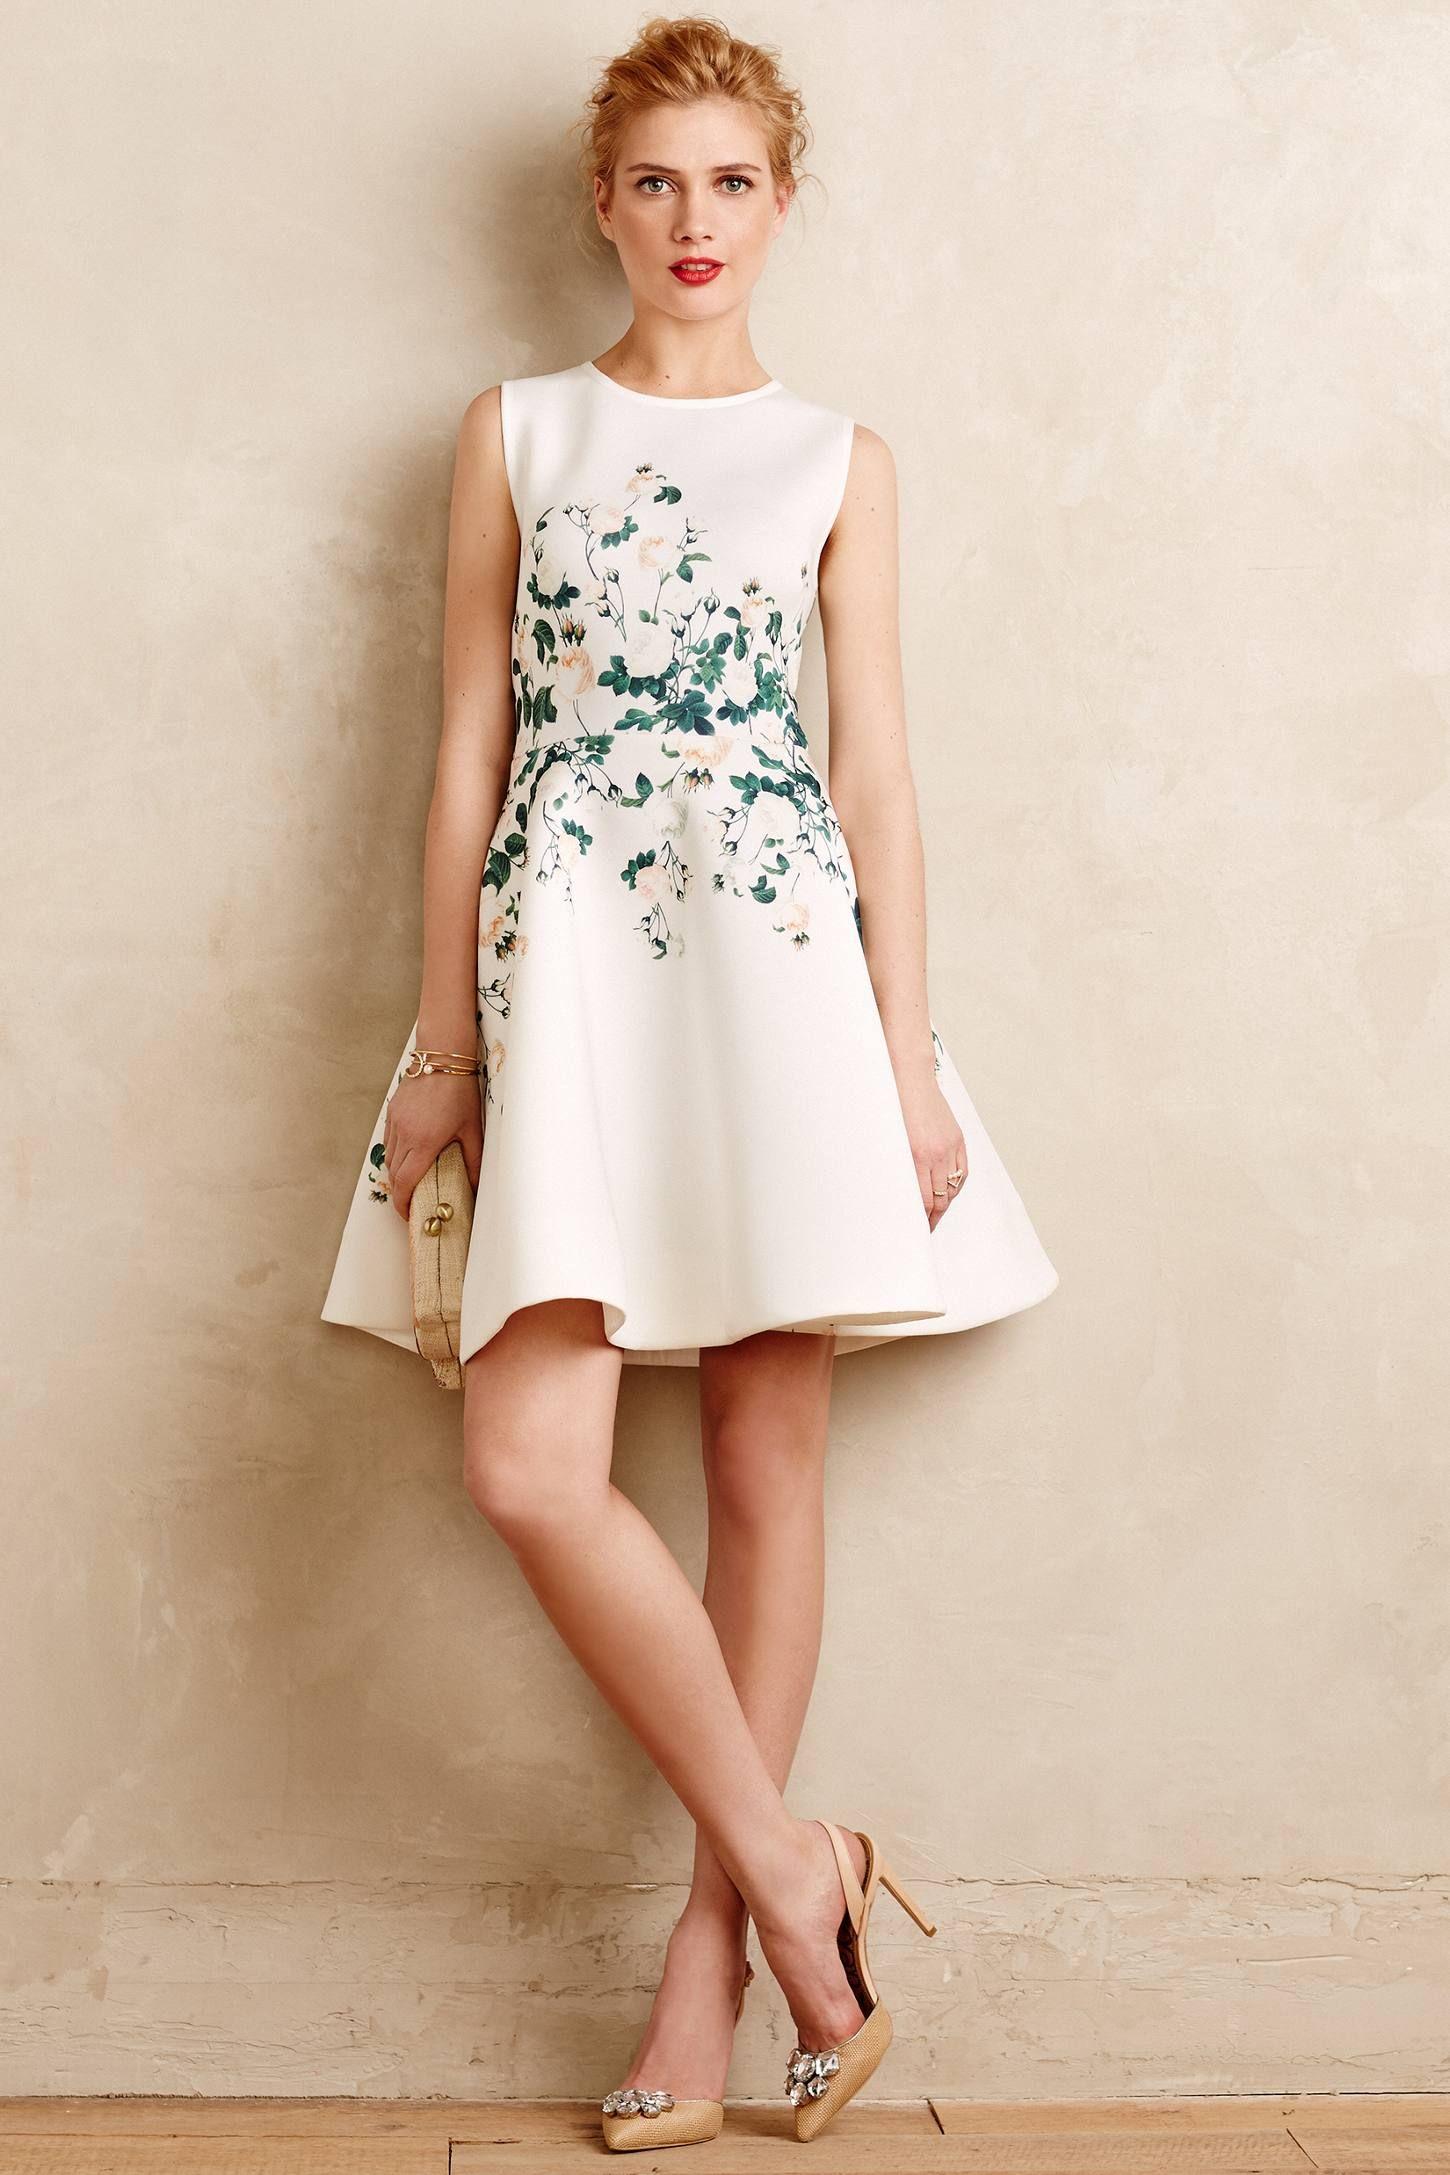 NWT Anthropologie Lillian Column Dress by Byron Lars Size 6P P6 $658